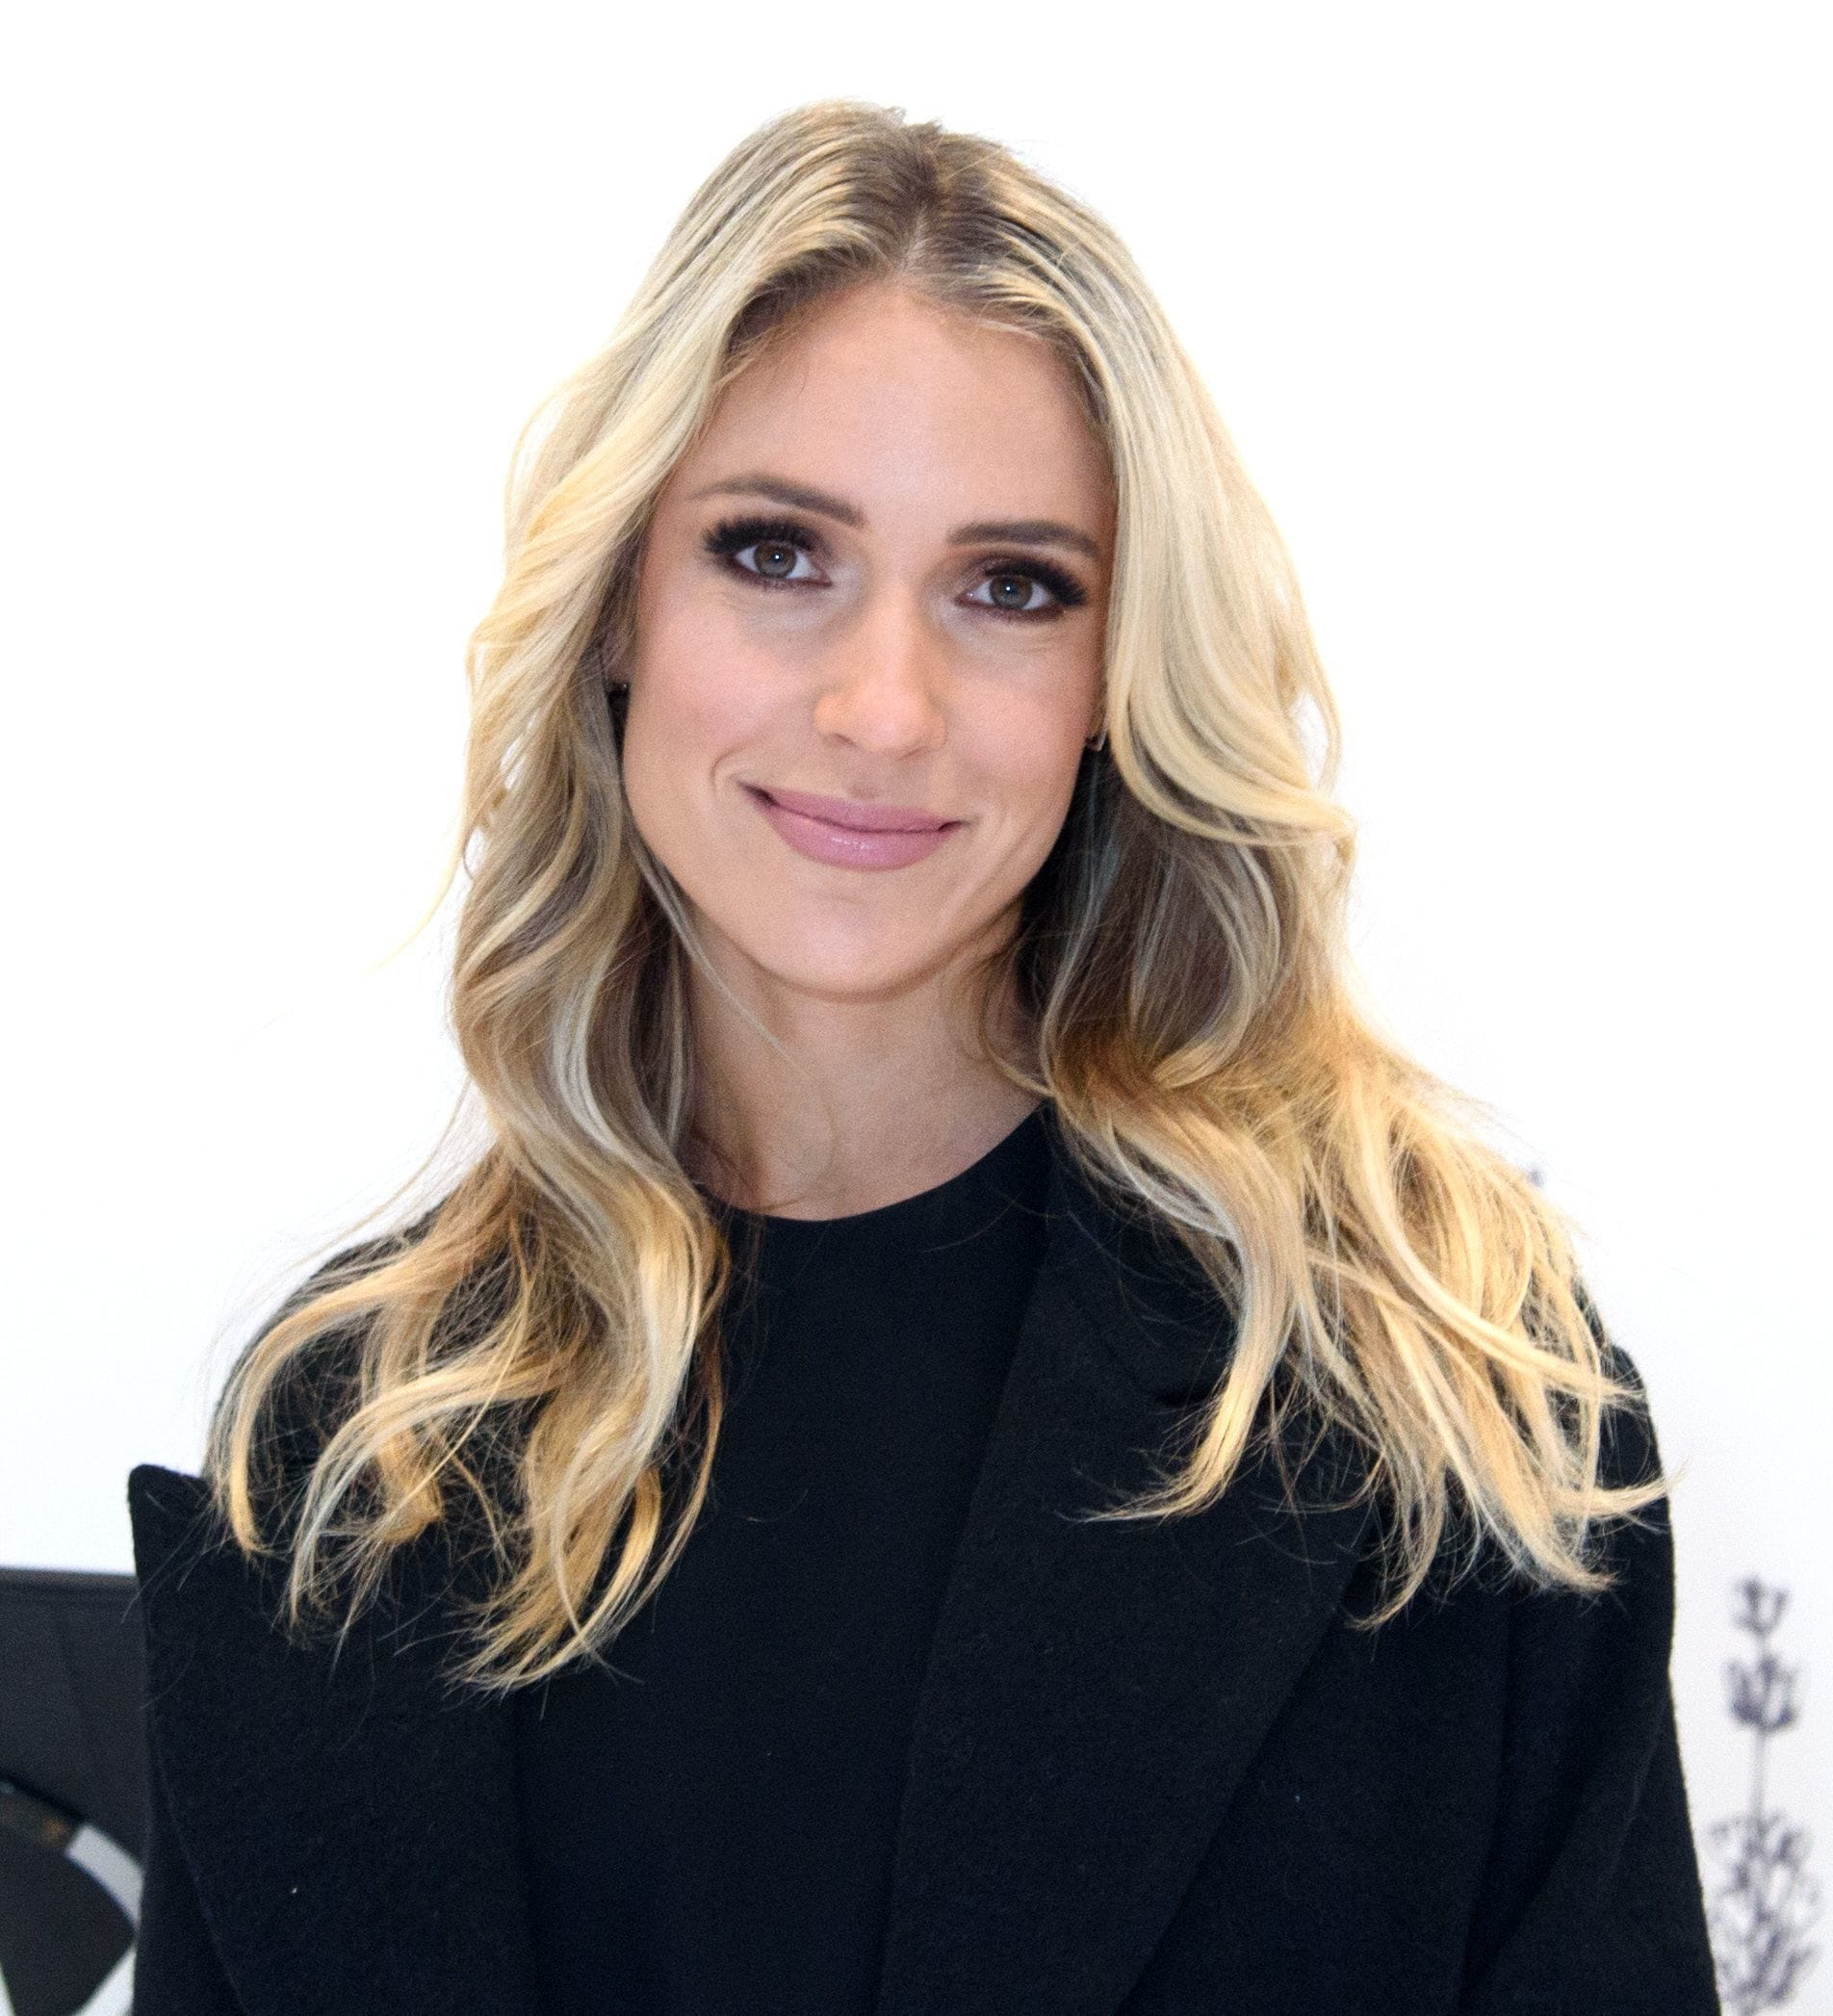 Kristin Cavallari's New Cut Is Giving Laguna Beach Fans Serious In Kristin Cavallari Short Hairstyles (View 12 of 25)